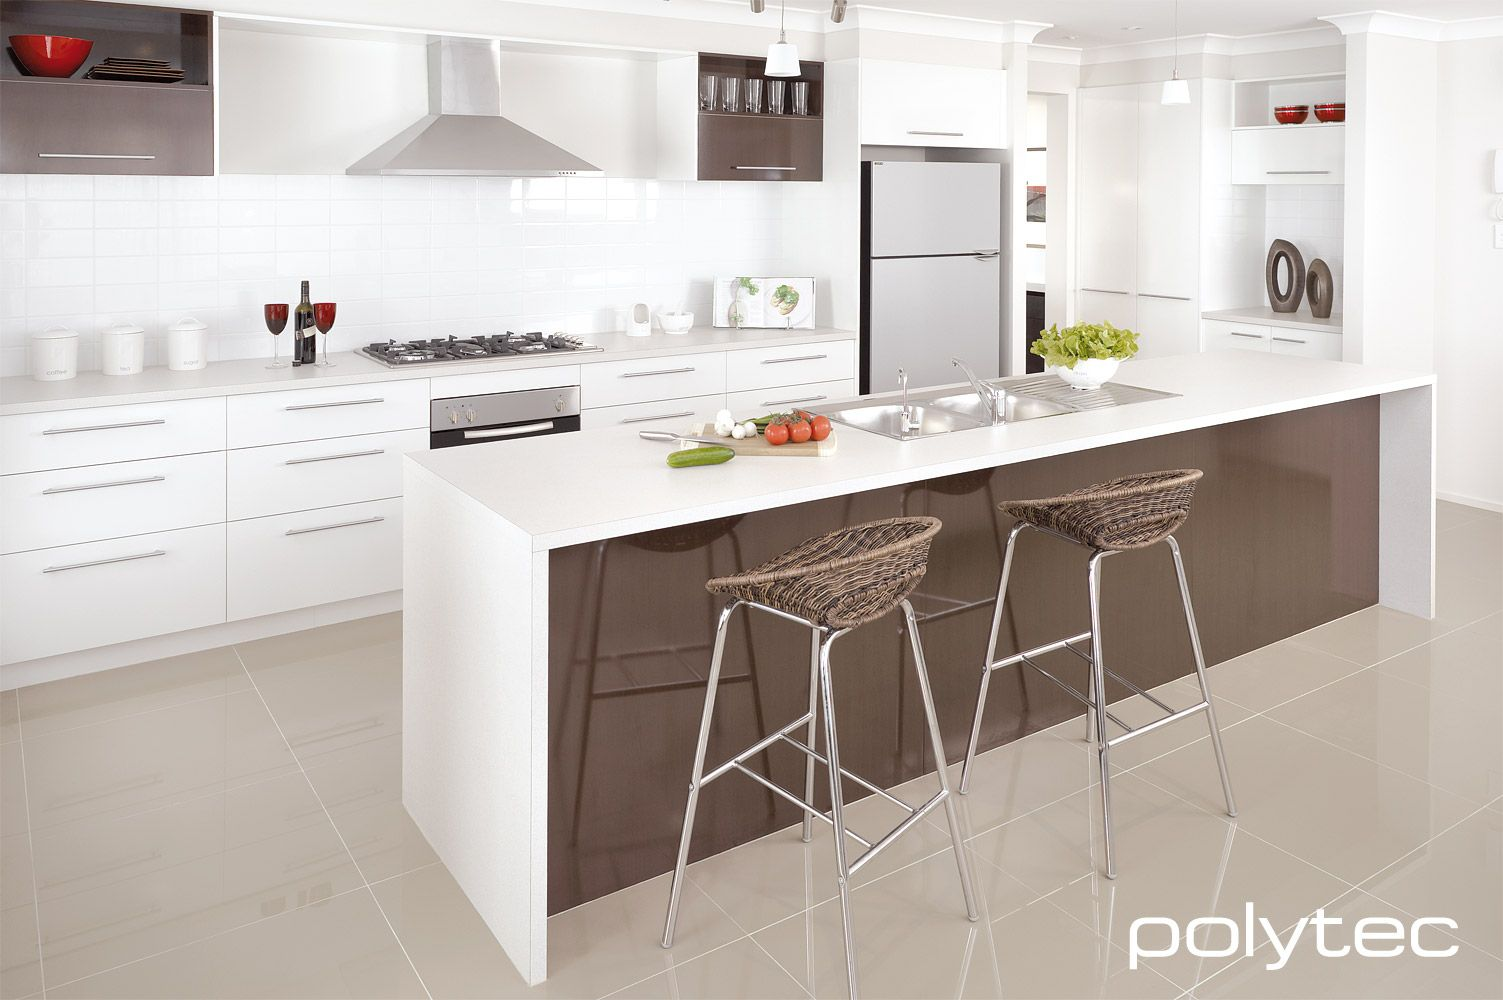 Polytec Doors & Backsplash Best Polytec Inspiration Images